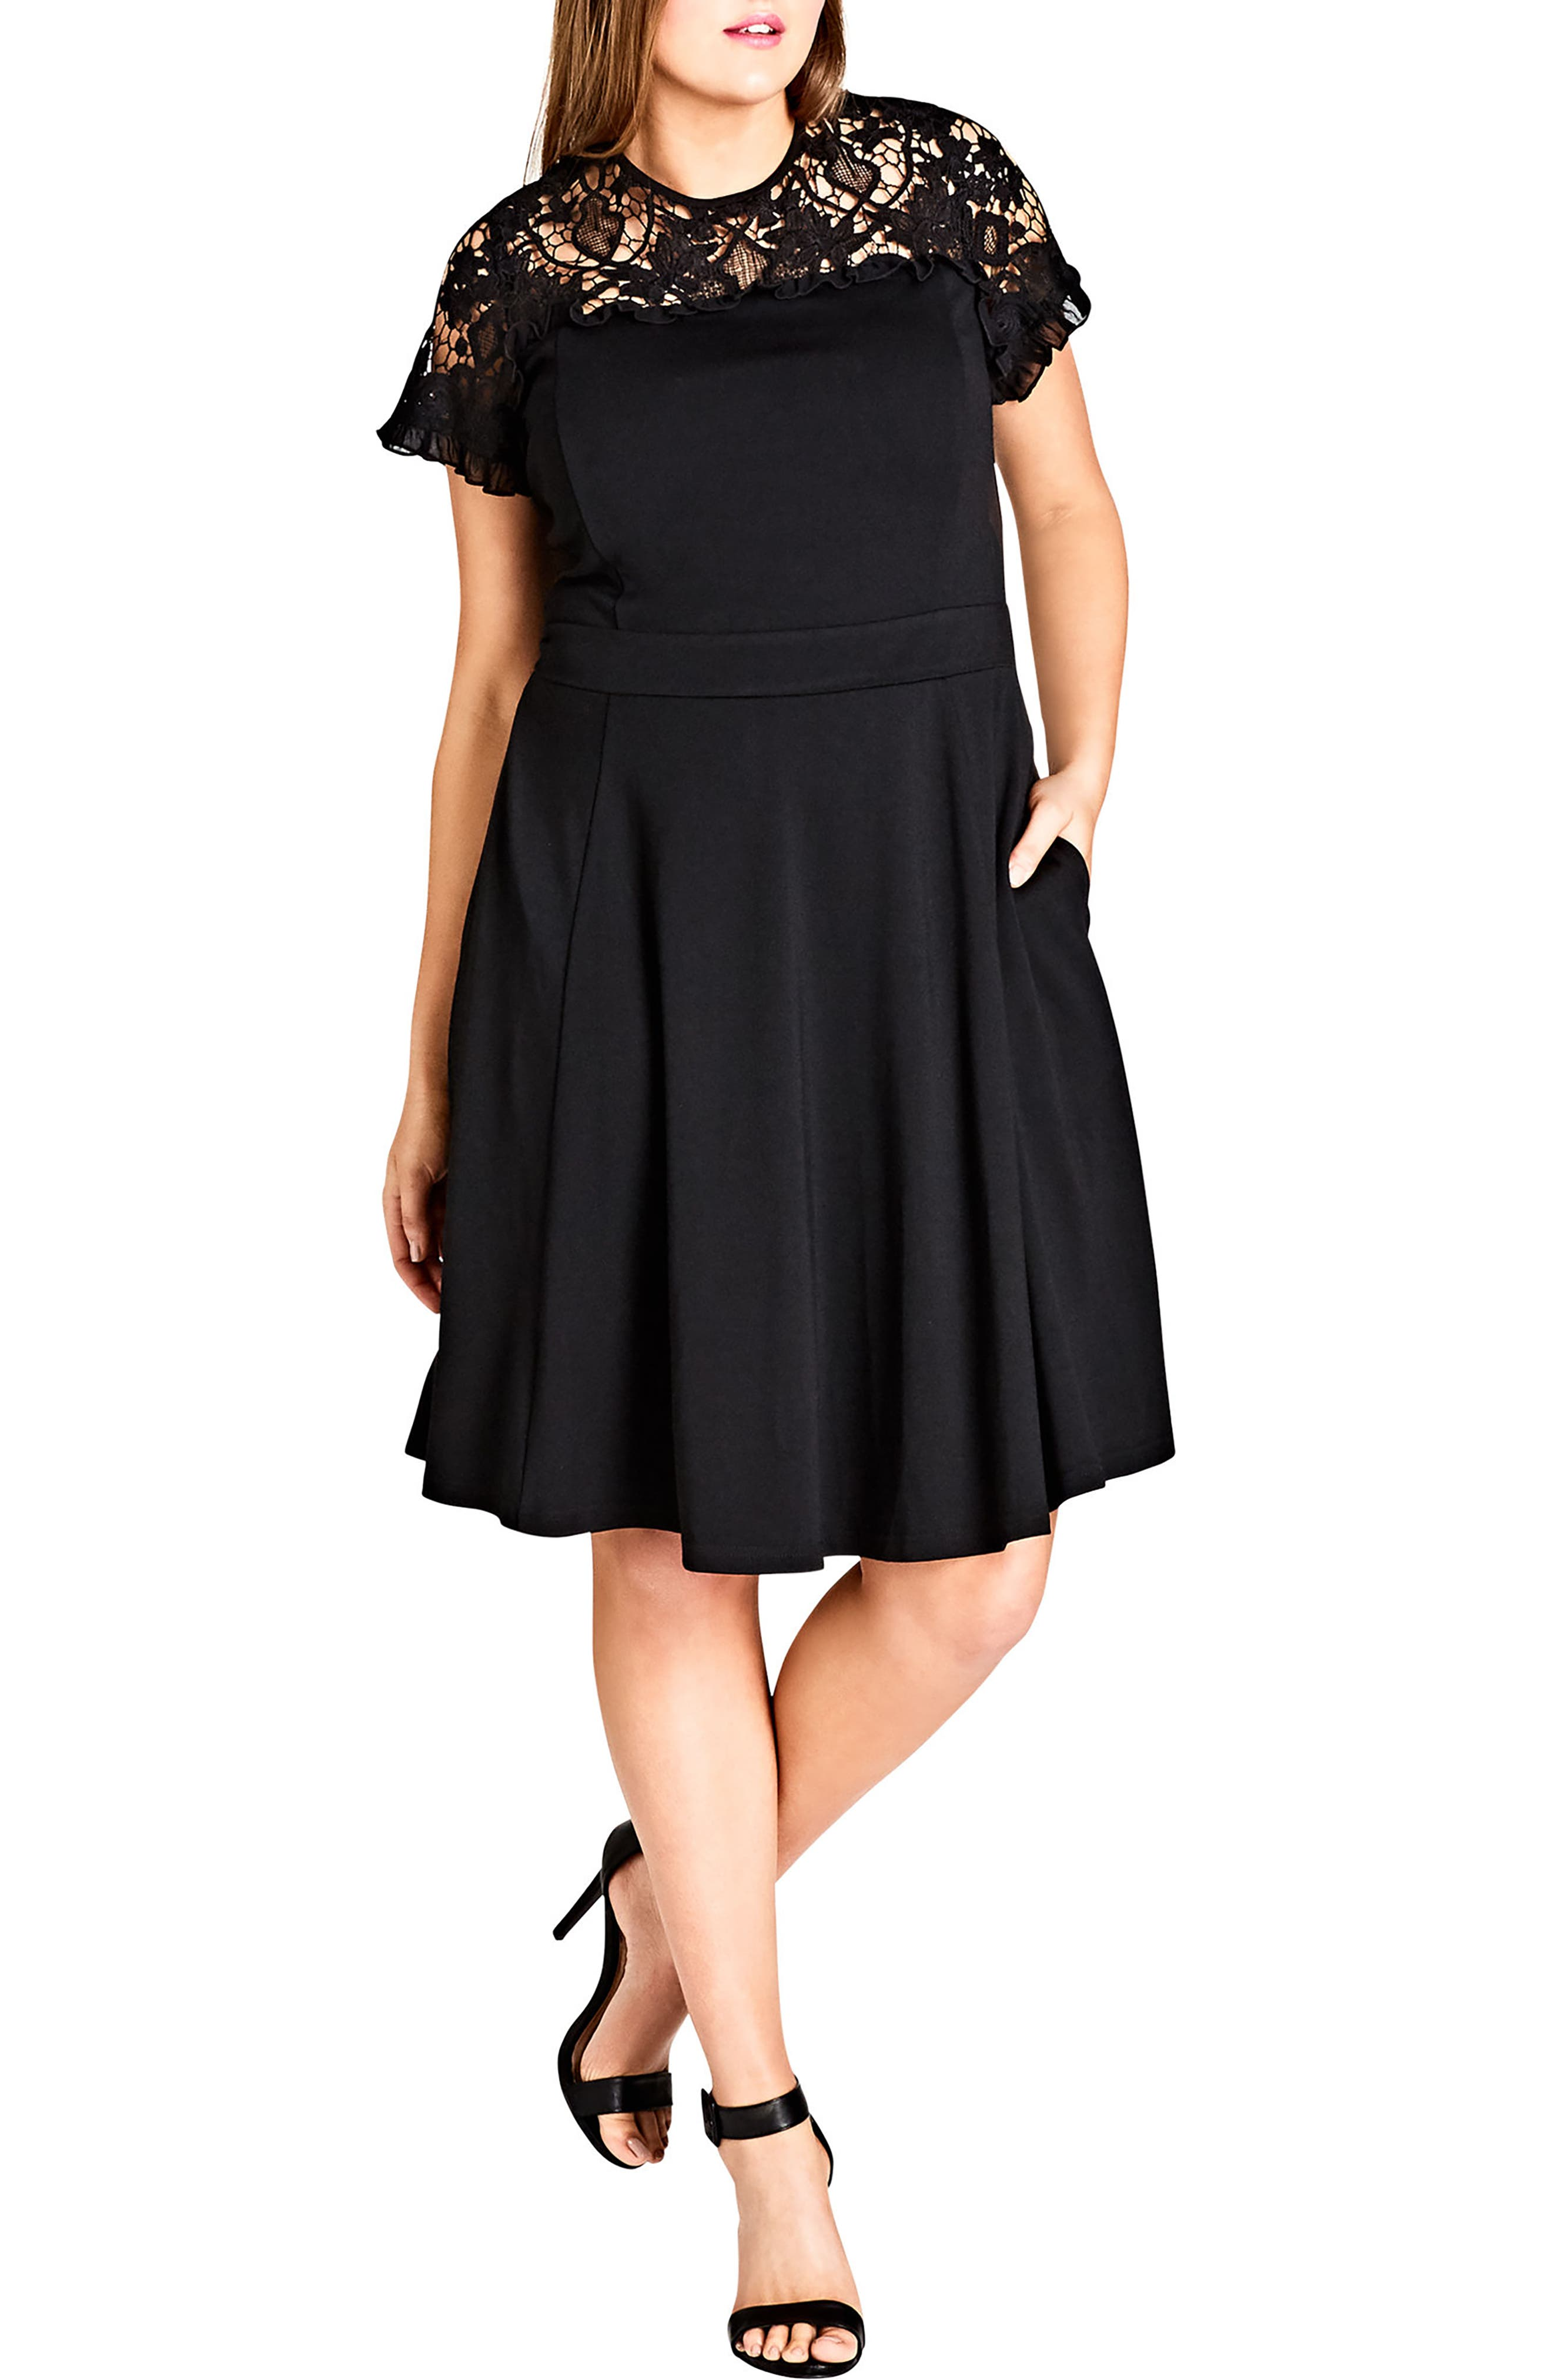 Plus Size City Chic Dark Mistress Lace Yoke A-Line Dress, Black